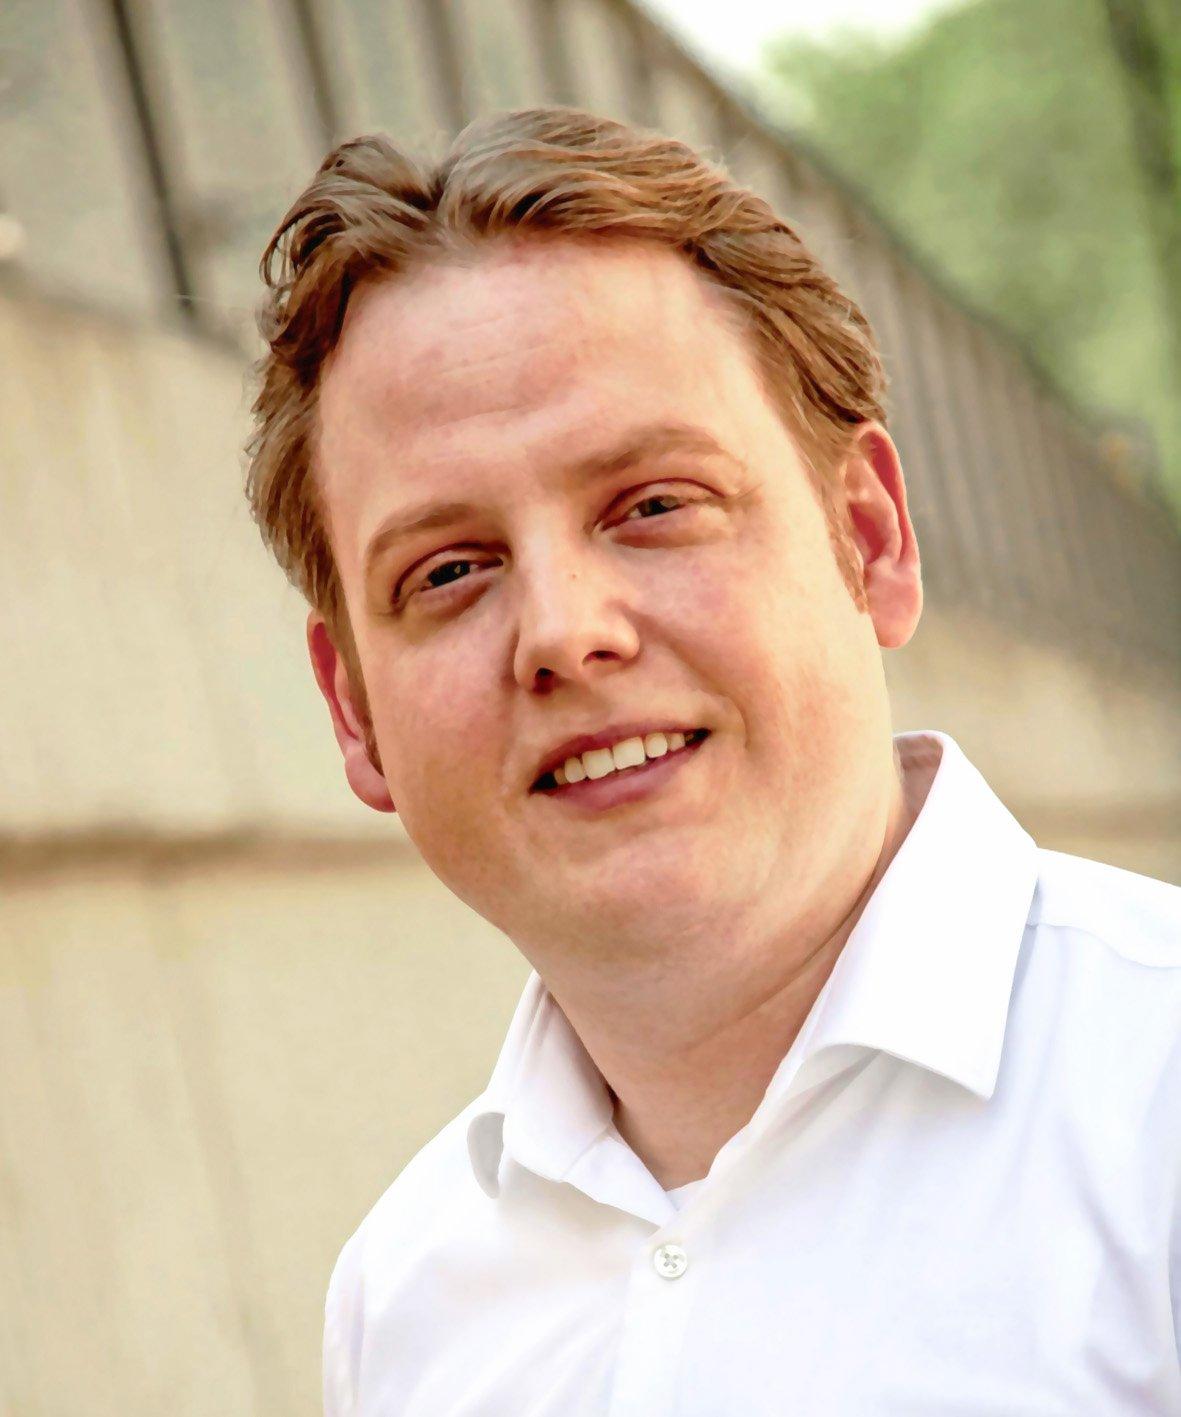 The speaker Jonas von Dall'Armi, 's profile image